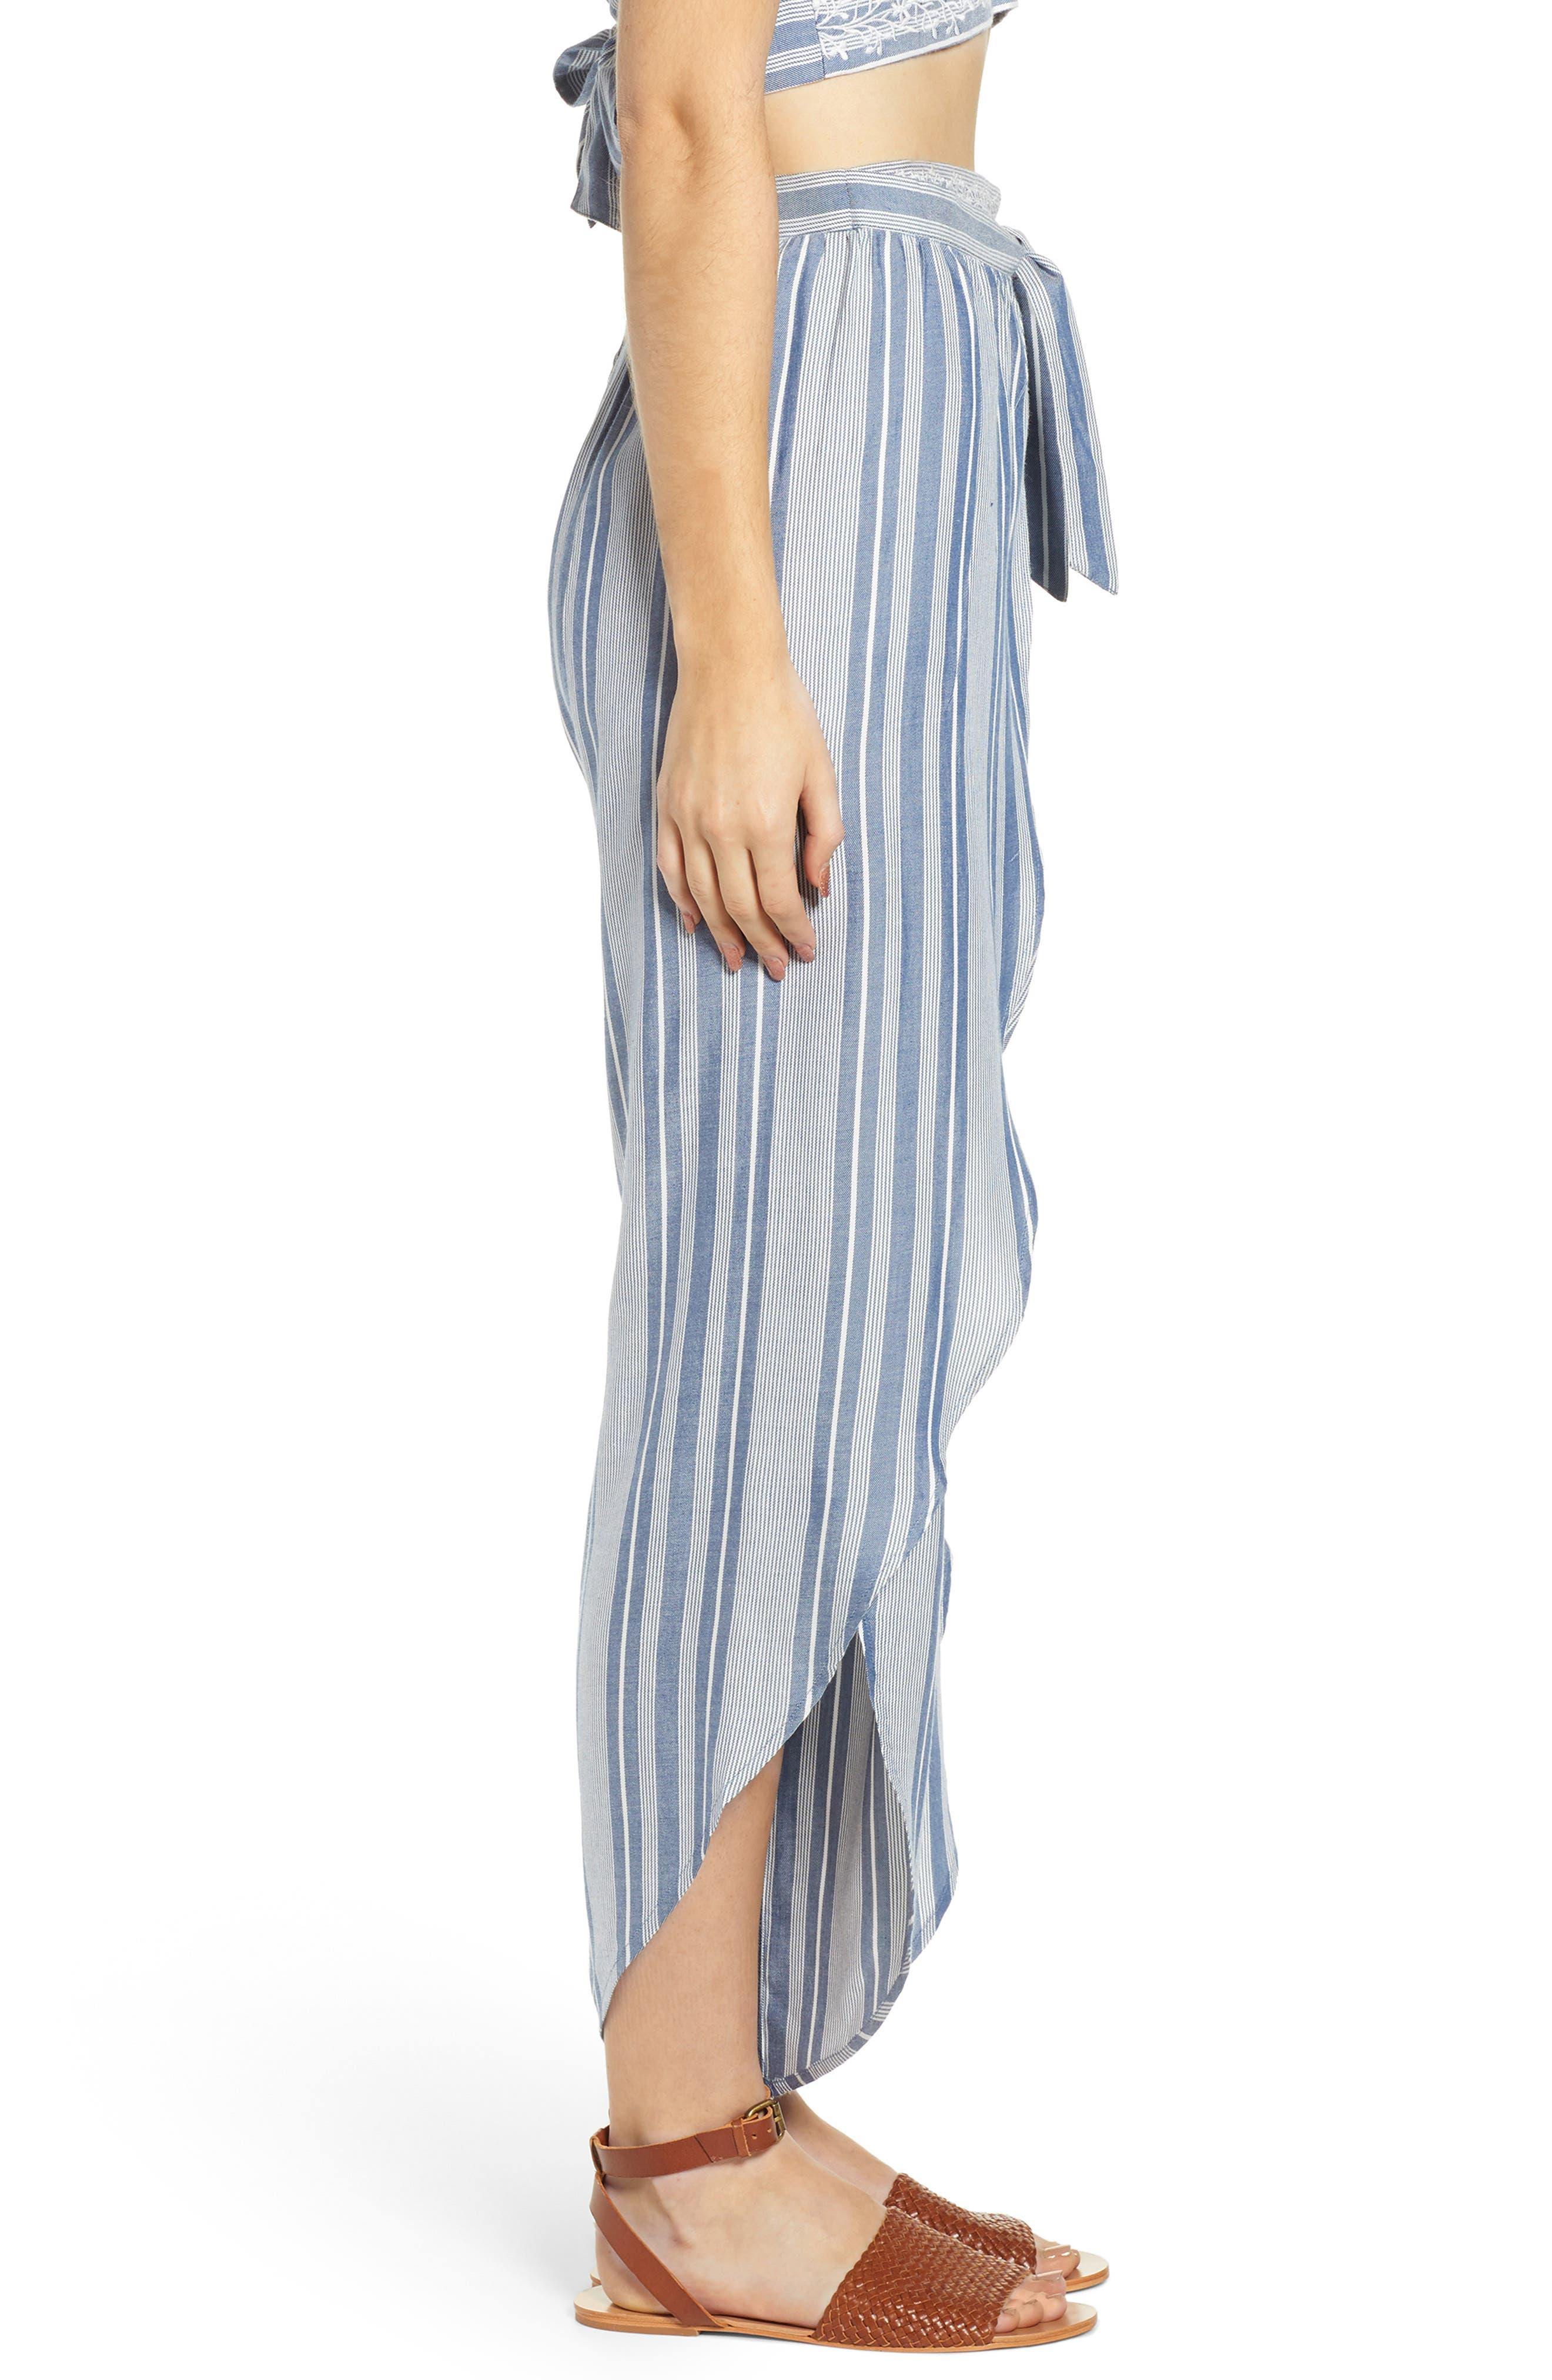 Jessa Stripe Tulip Hem Pants,                             Alternate thumbnail 3, color,                             MARSHMALLOW EMBROIDERED FLORAL